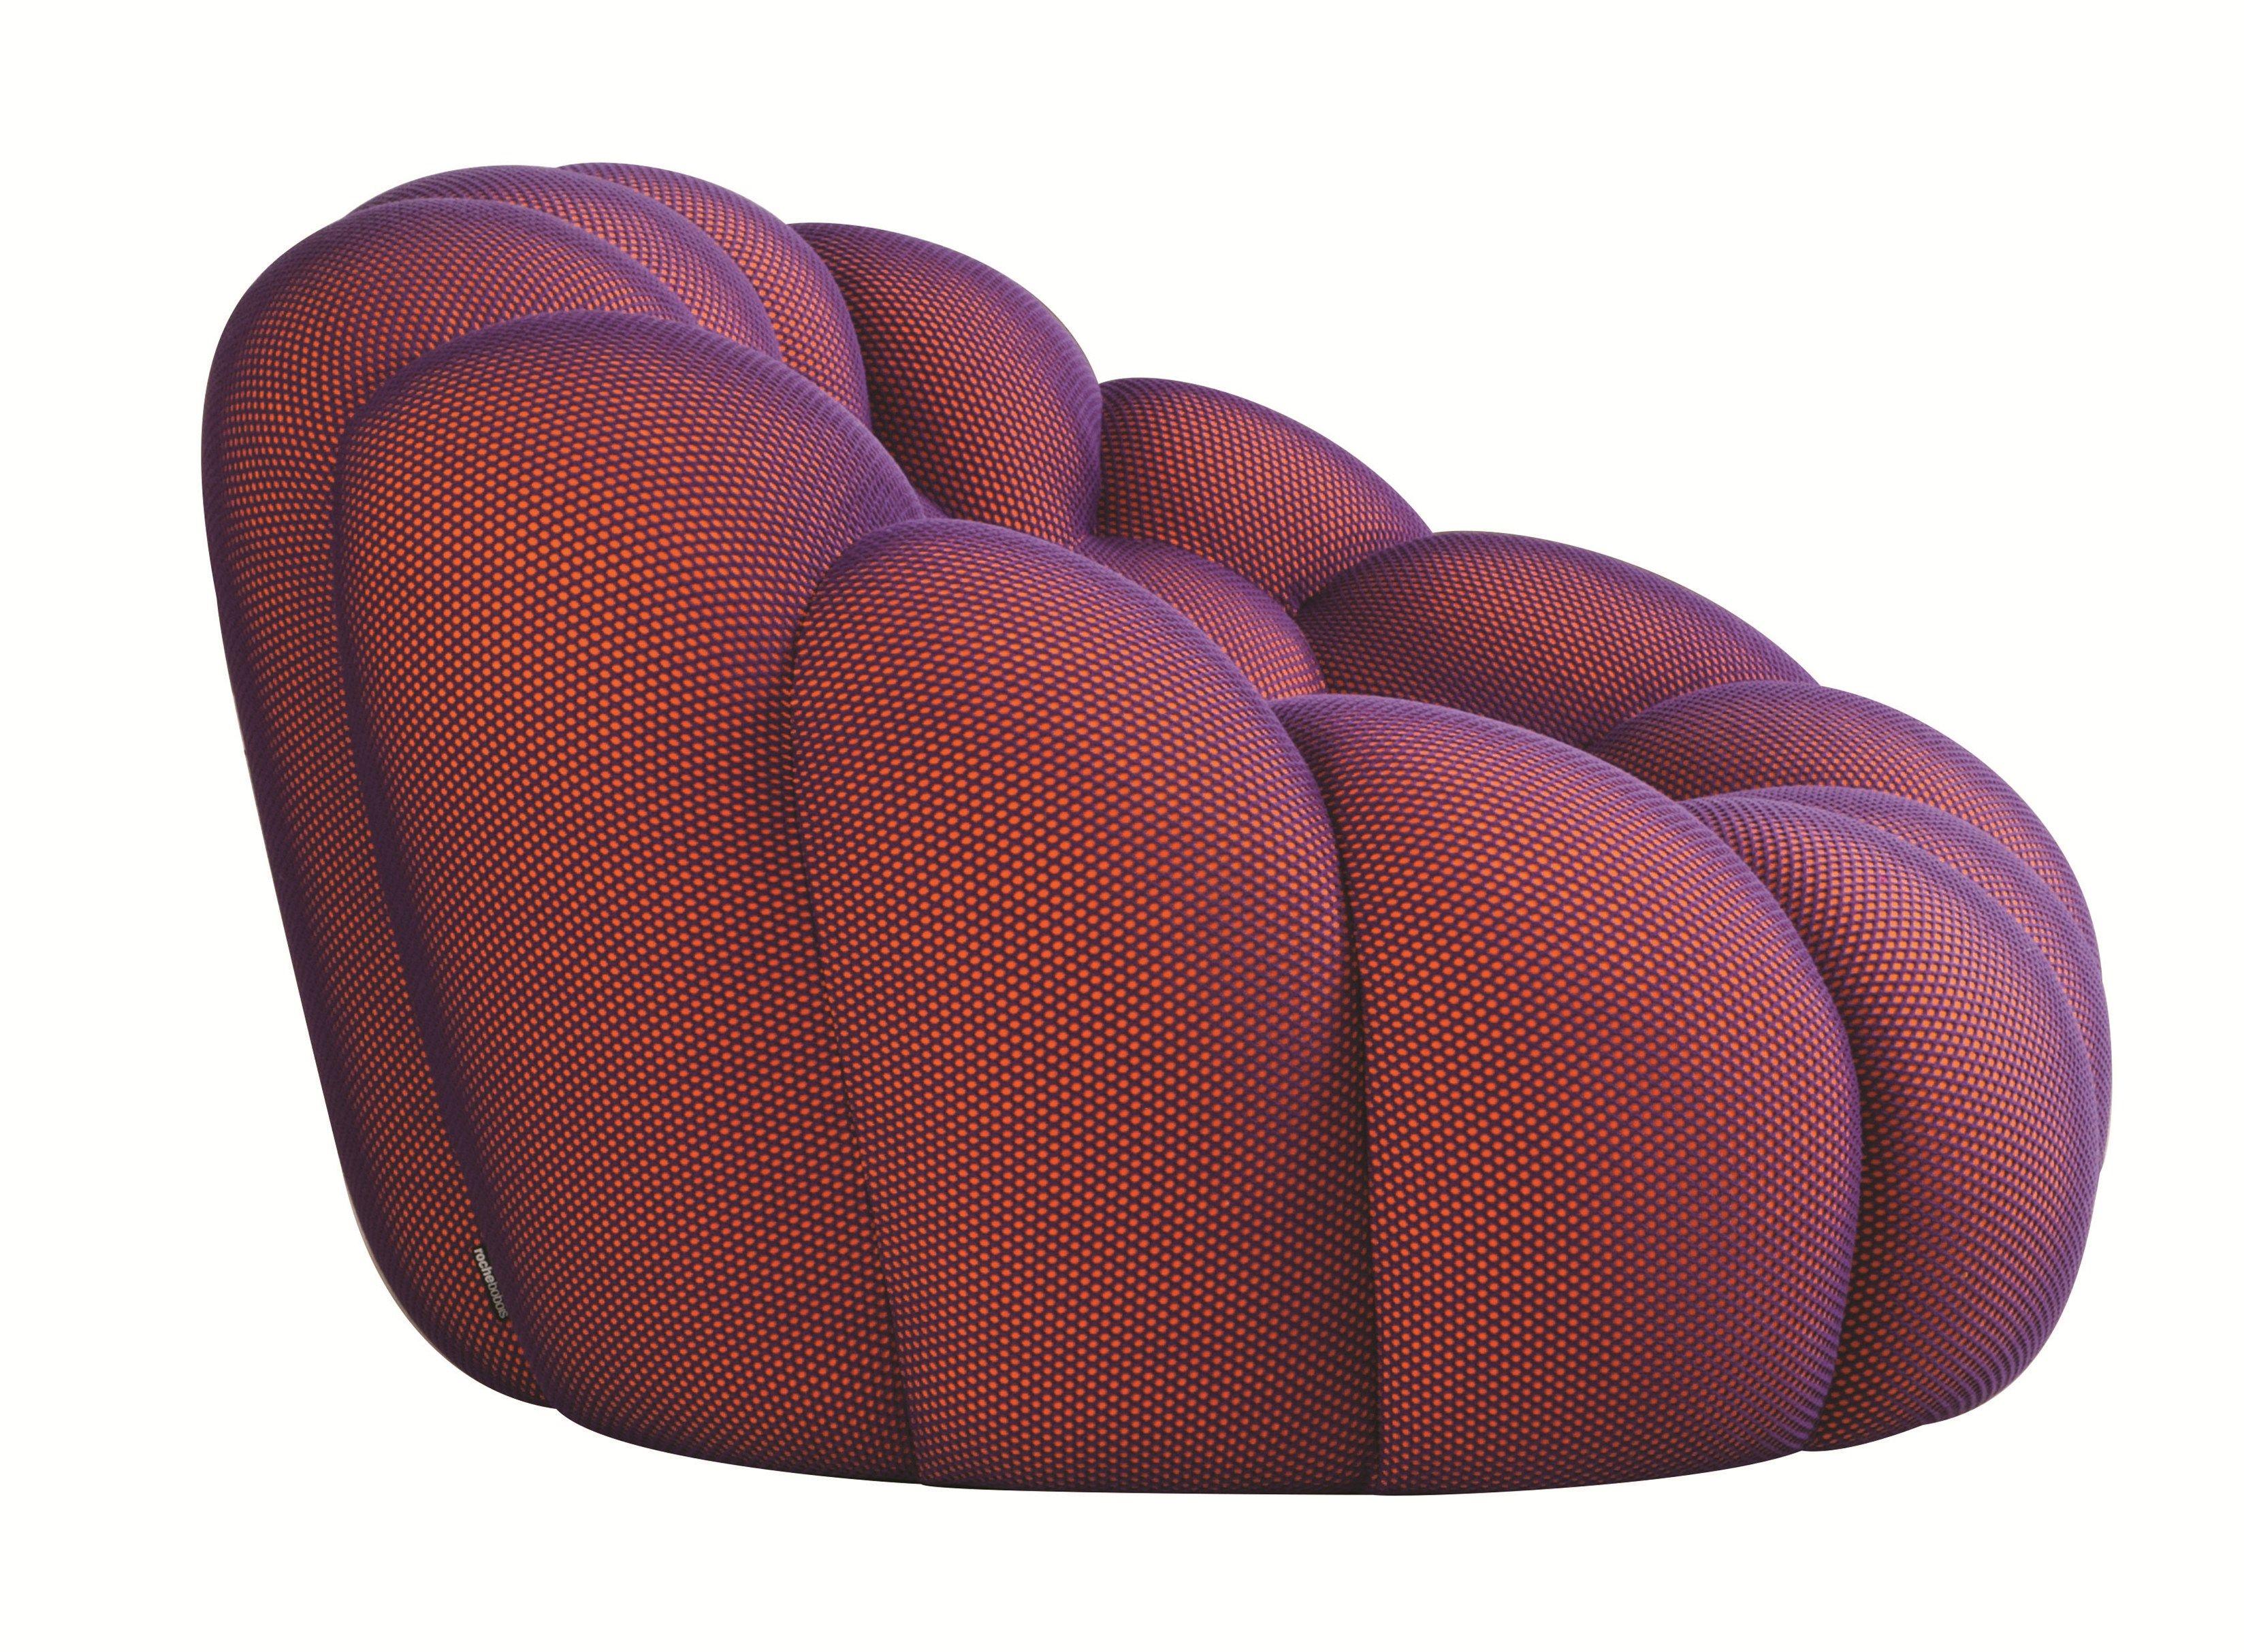 bubble fauteuil by roche bobois design sacha lakic. Black Bedroom Furniture Sets. Home Design Ideas